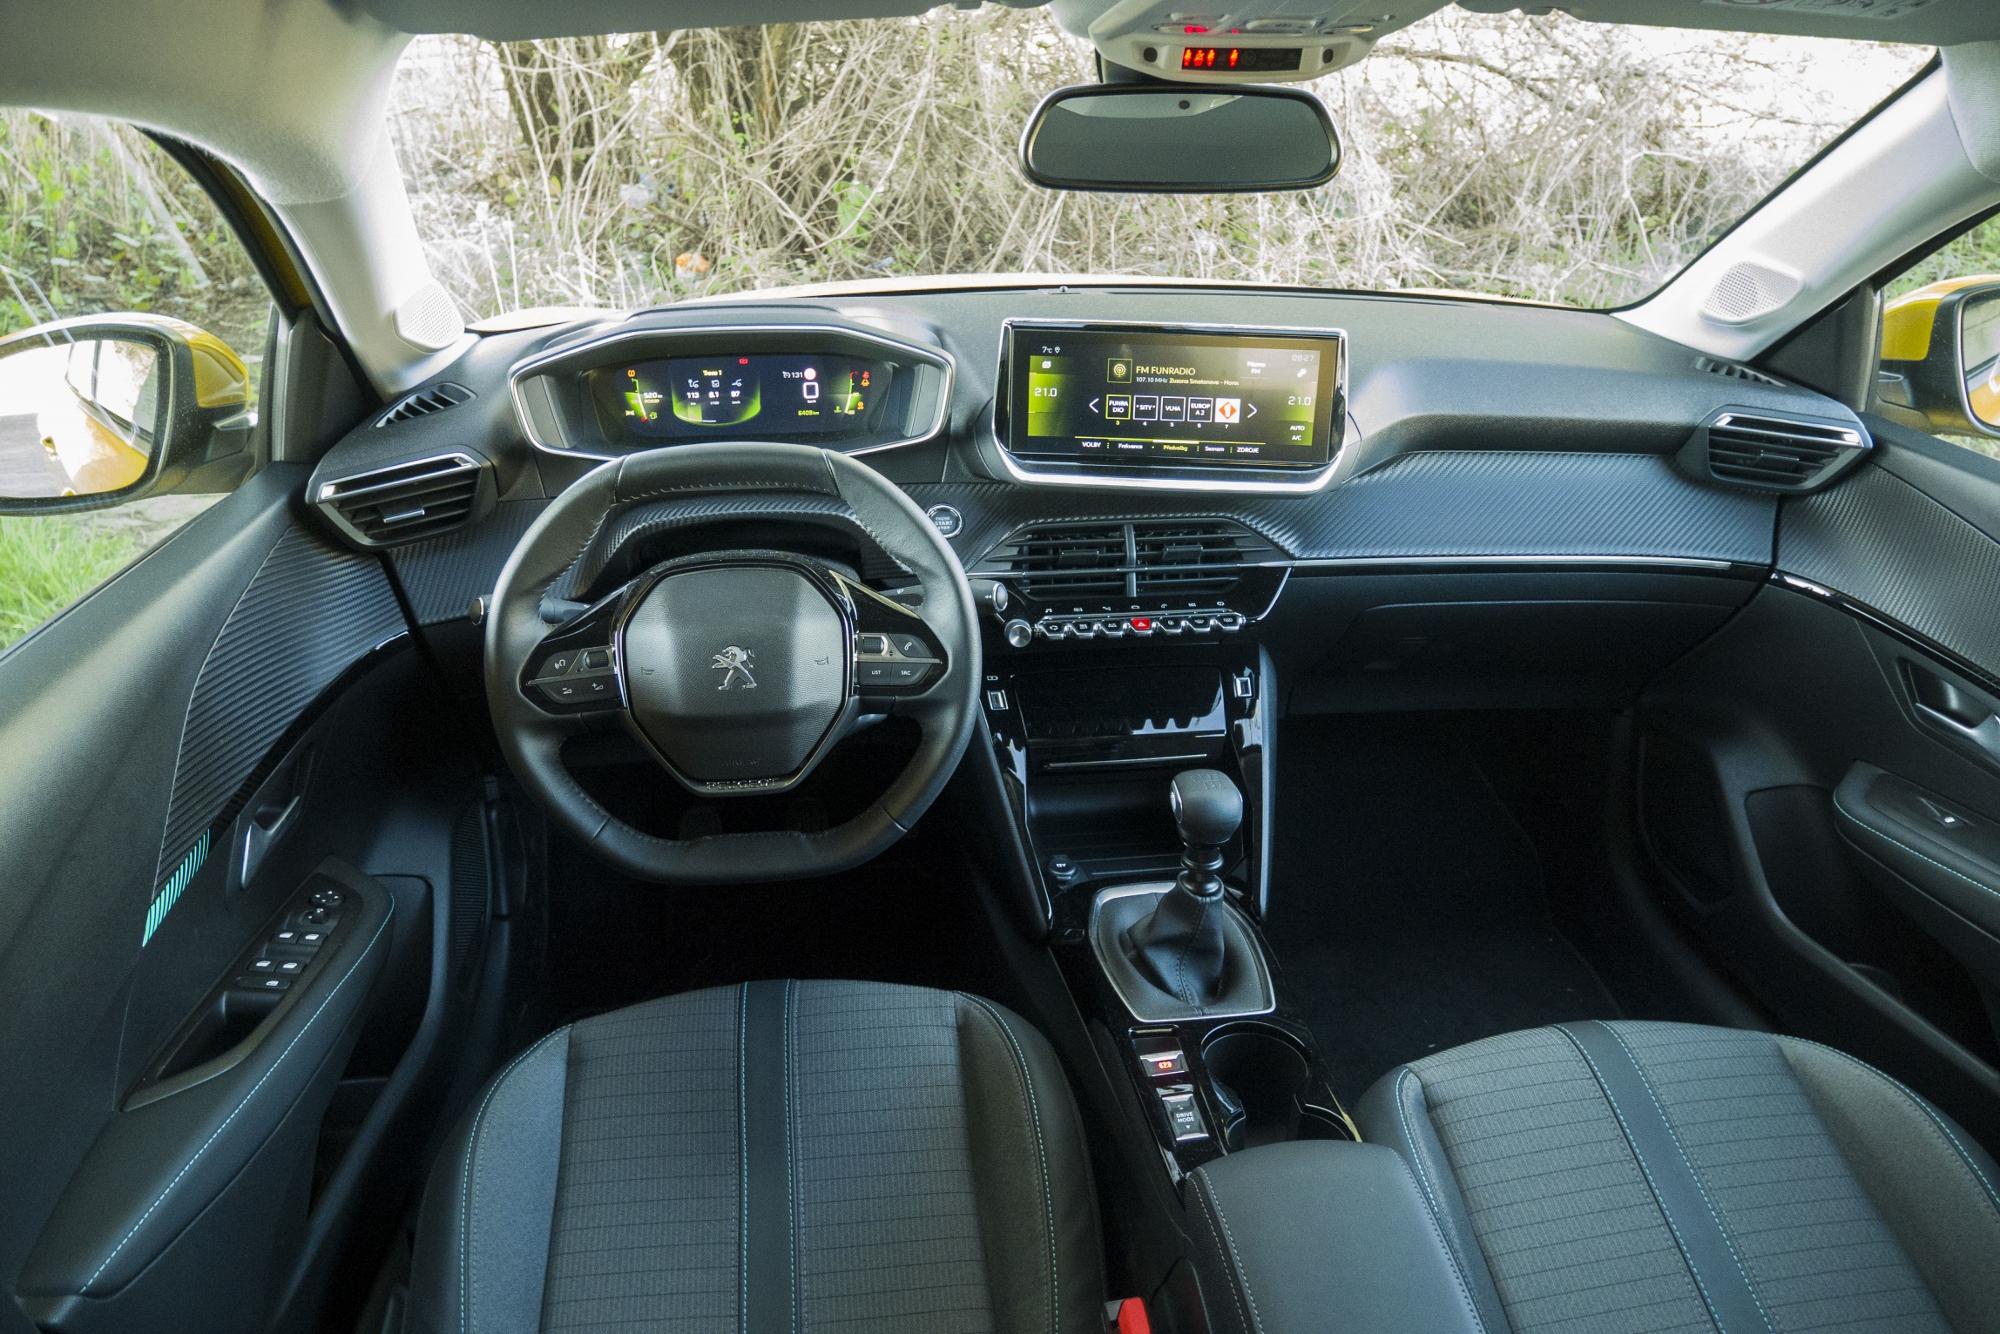 Test: Peugeot 208 prekvapivo pútal pohľady 7XXRx4IM1C peugeot-208-34